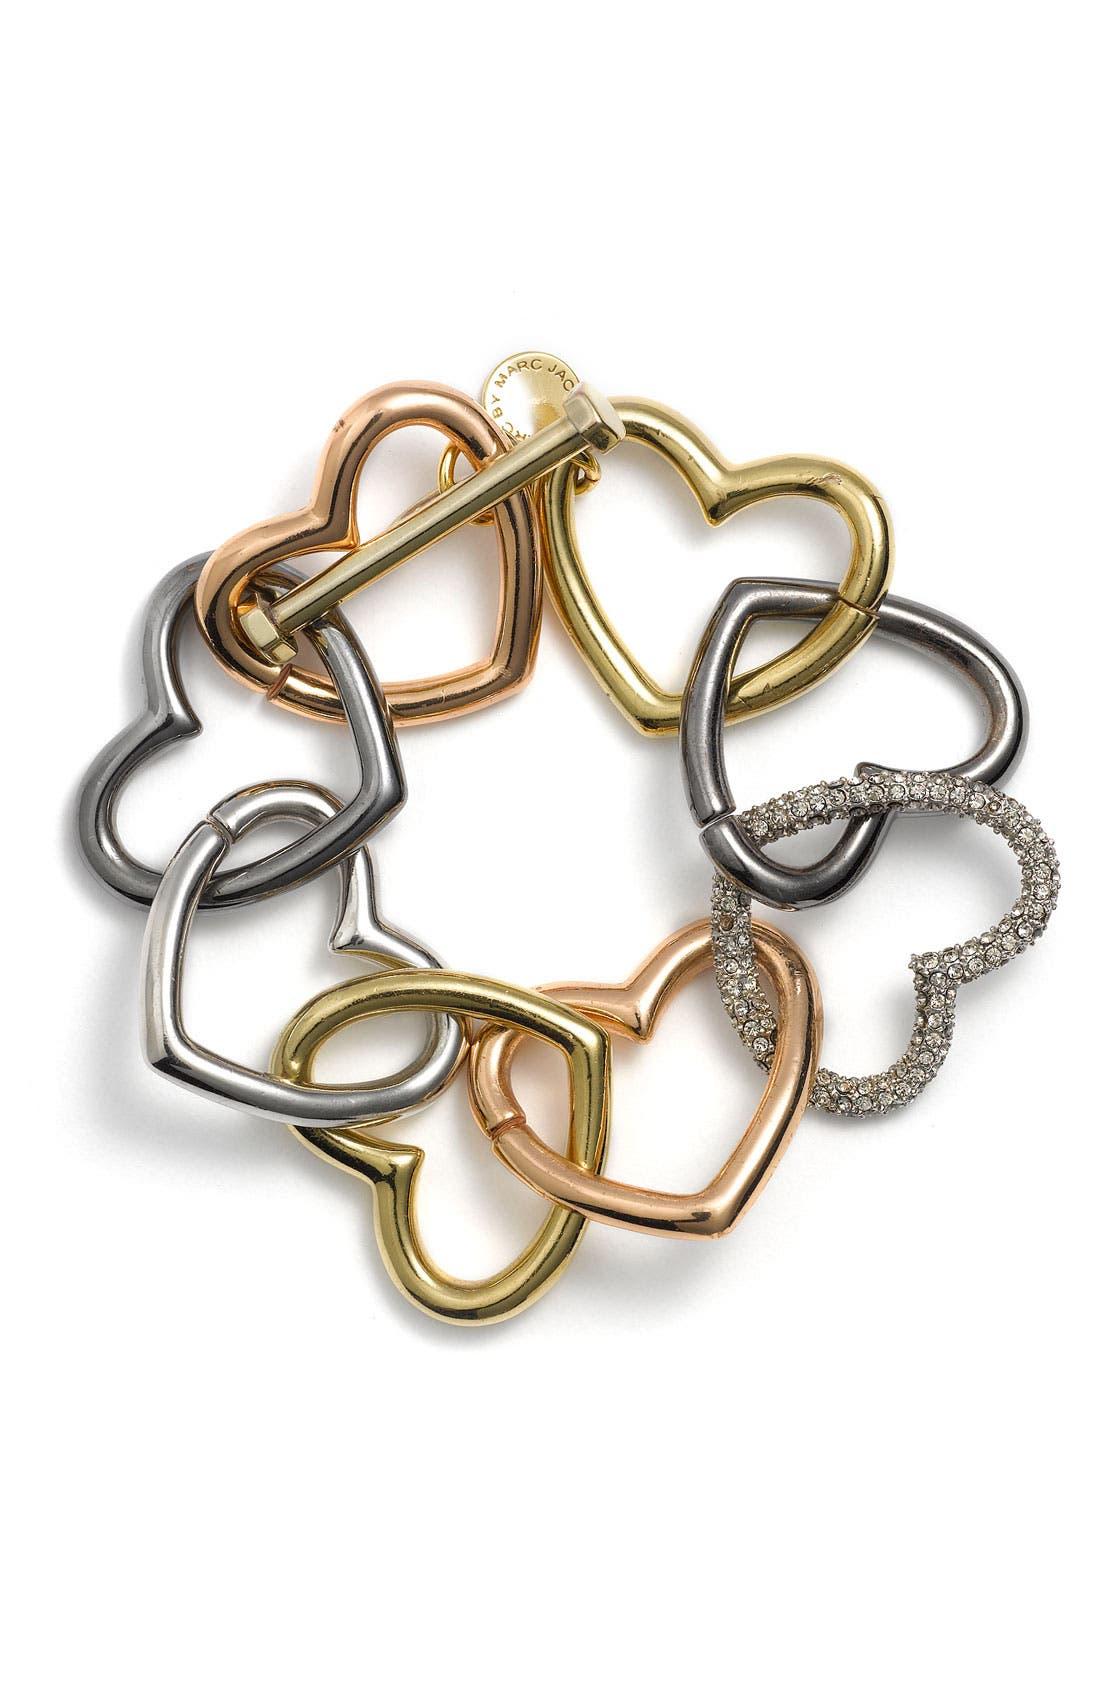 Alternate Image 1 Selected - MARC BY MARC JACOBS 'Love Edge' Heart Bracelet